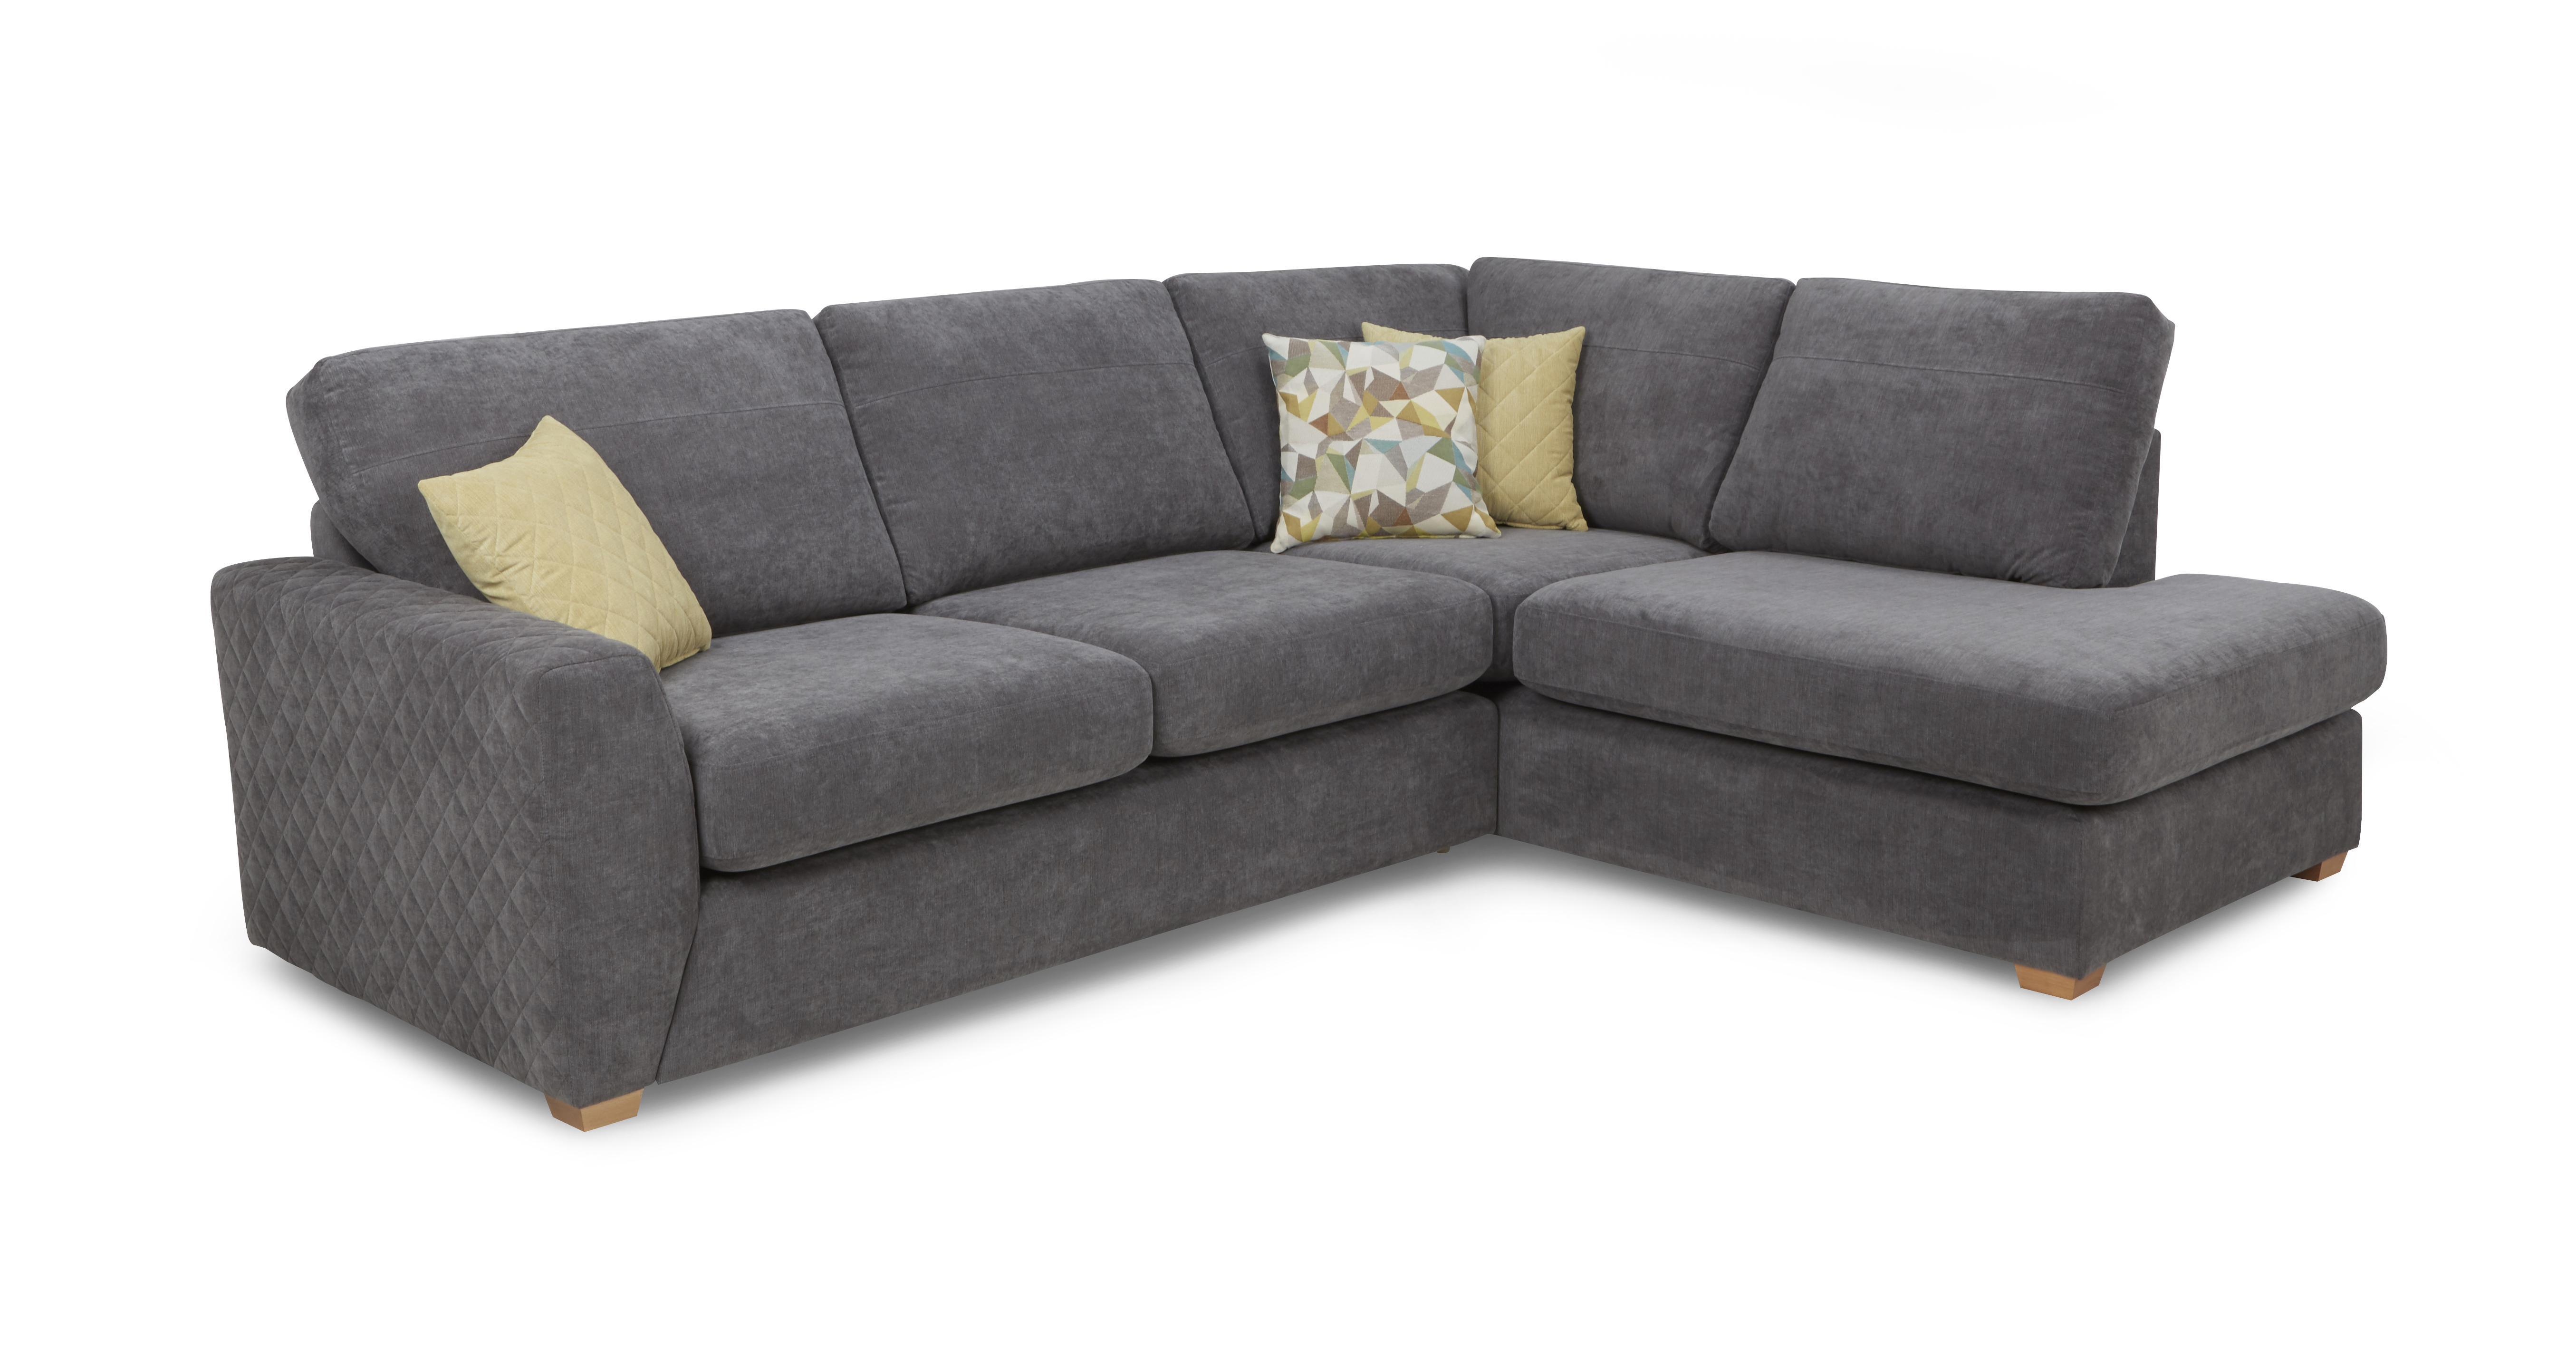 dfs navona sofa reviews restoration hardware 98 kensington leather zuri large ireland astaire